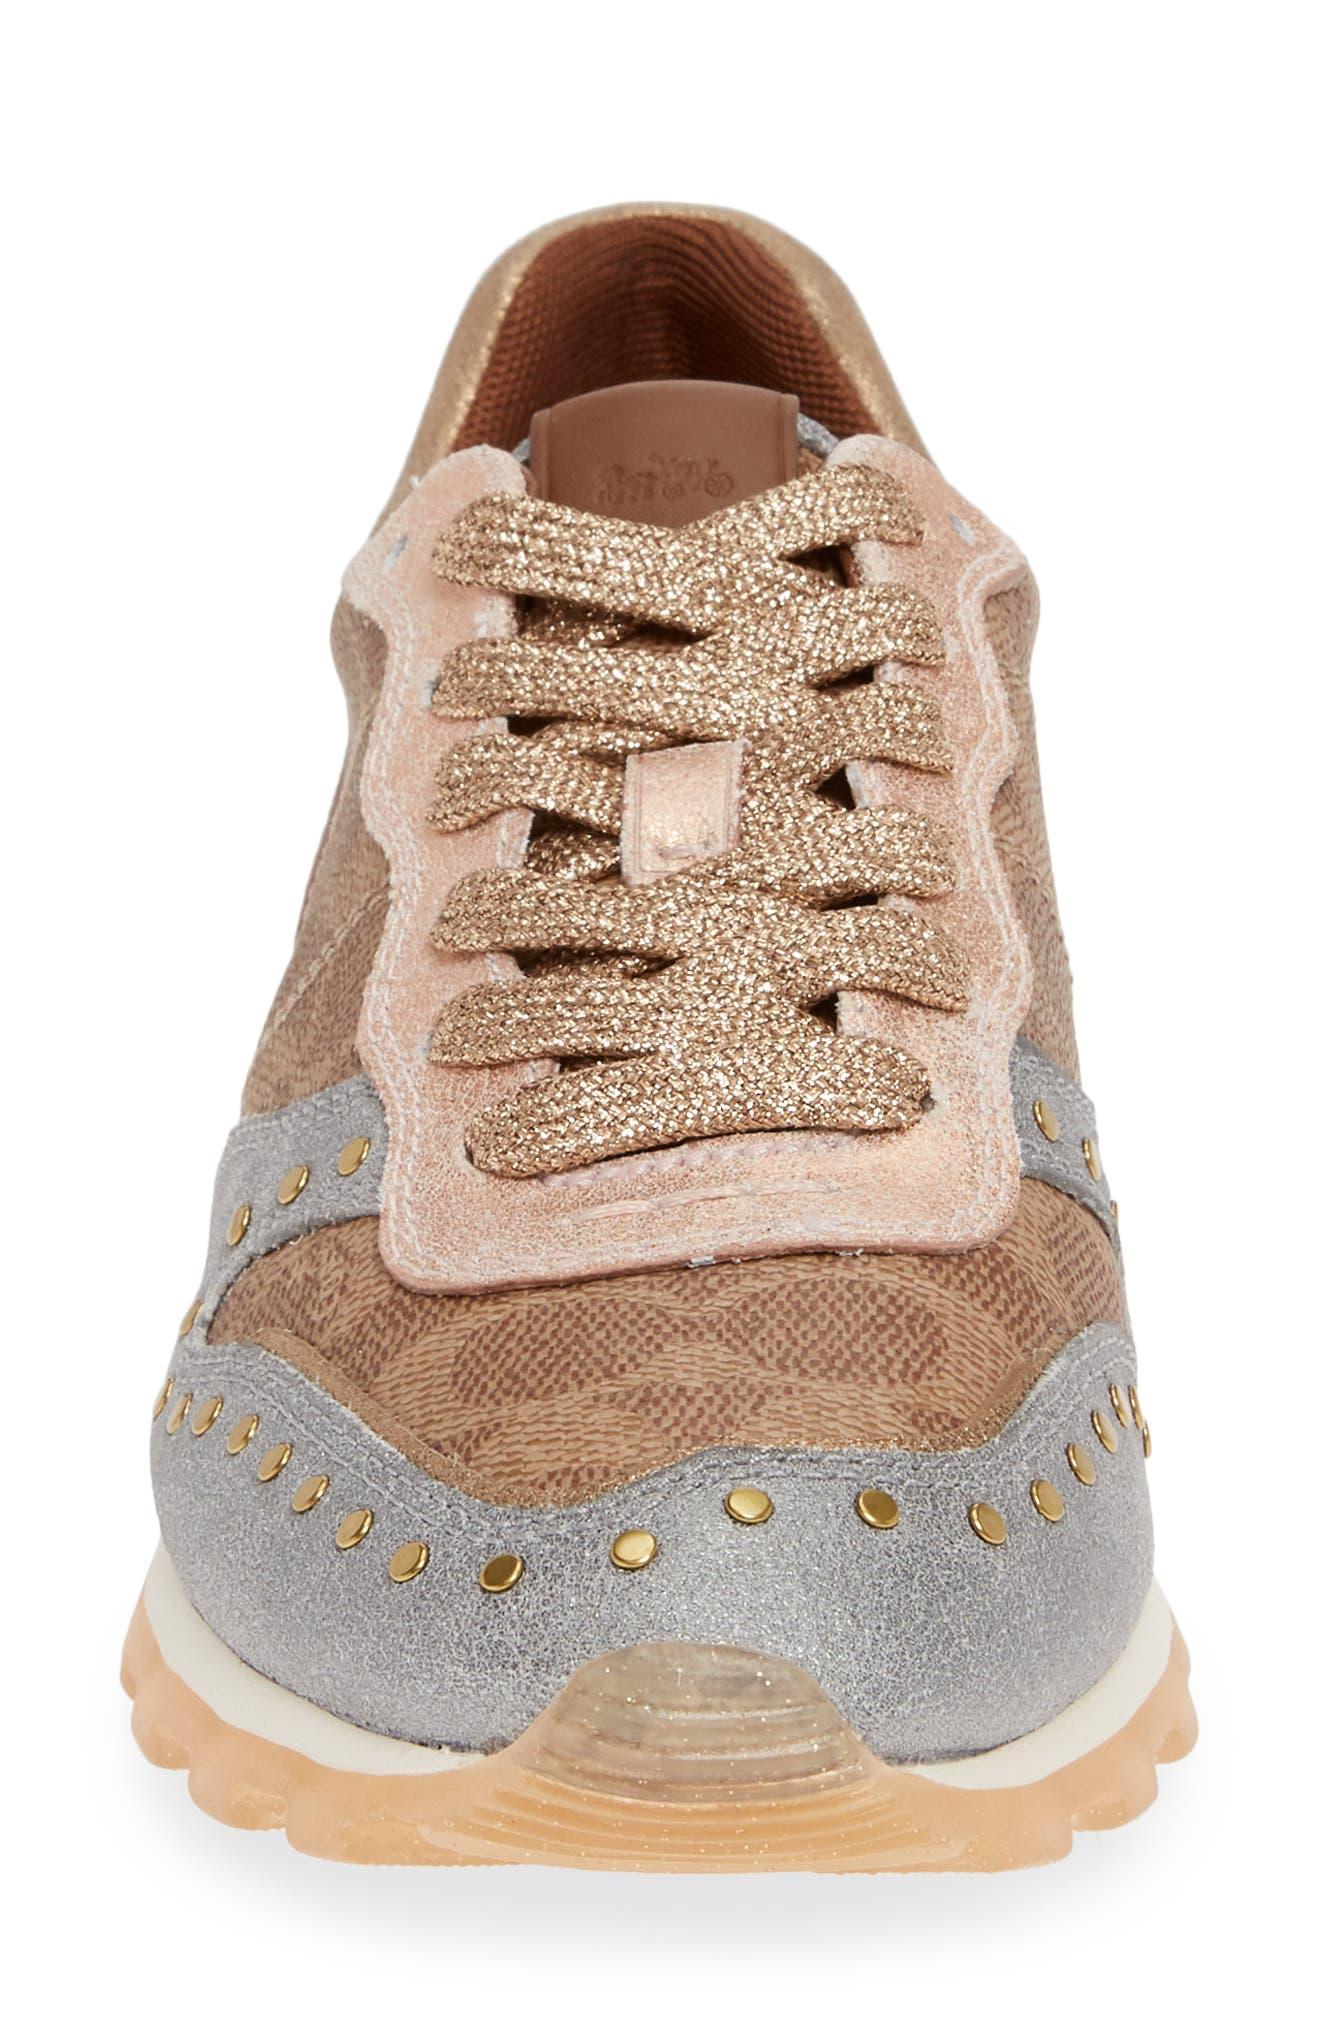 COACH, C118 Studded Sneaker, Alternate thumbnail 4, color, TAN/ GOLD MULTI